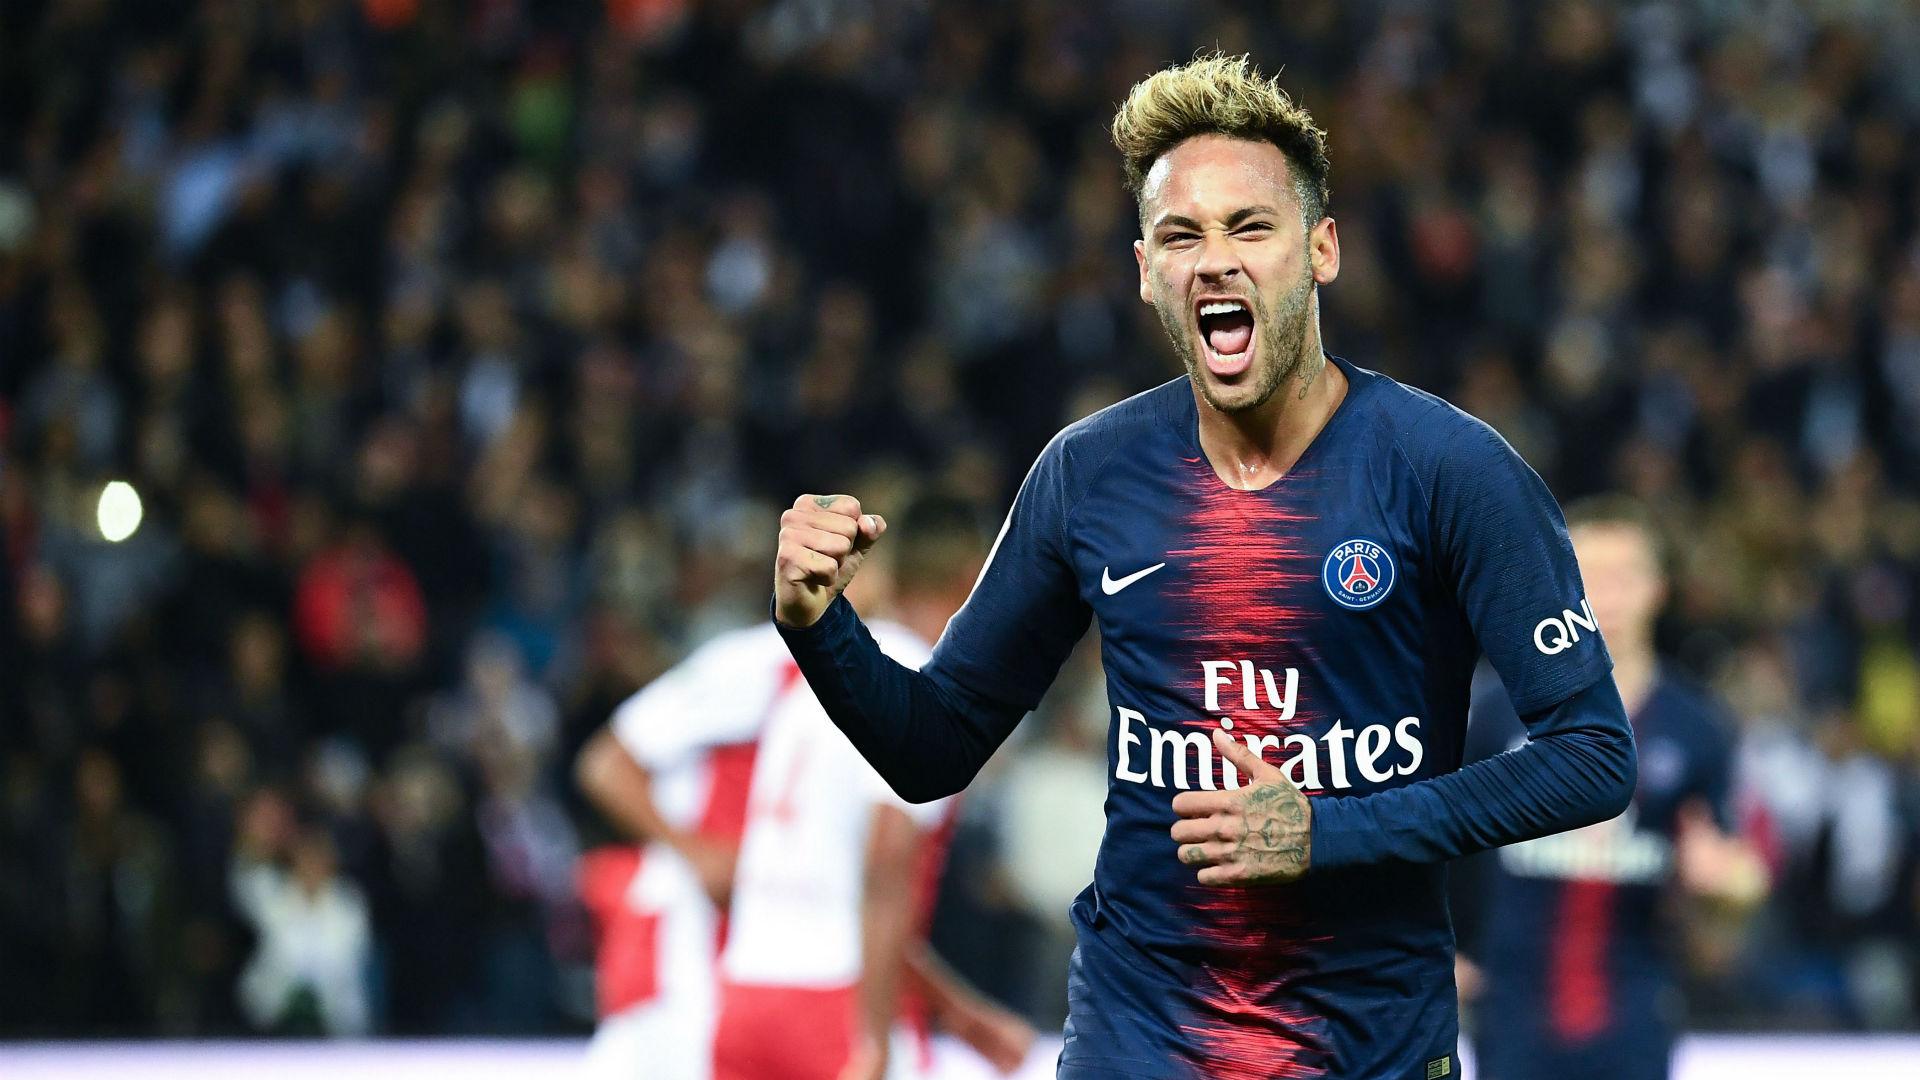 Resultado de imagen para Neymar Mbappe